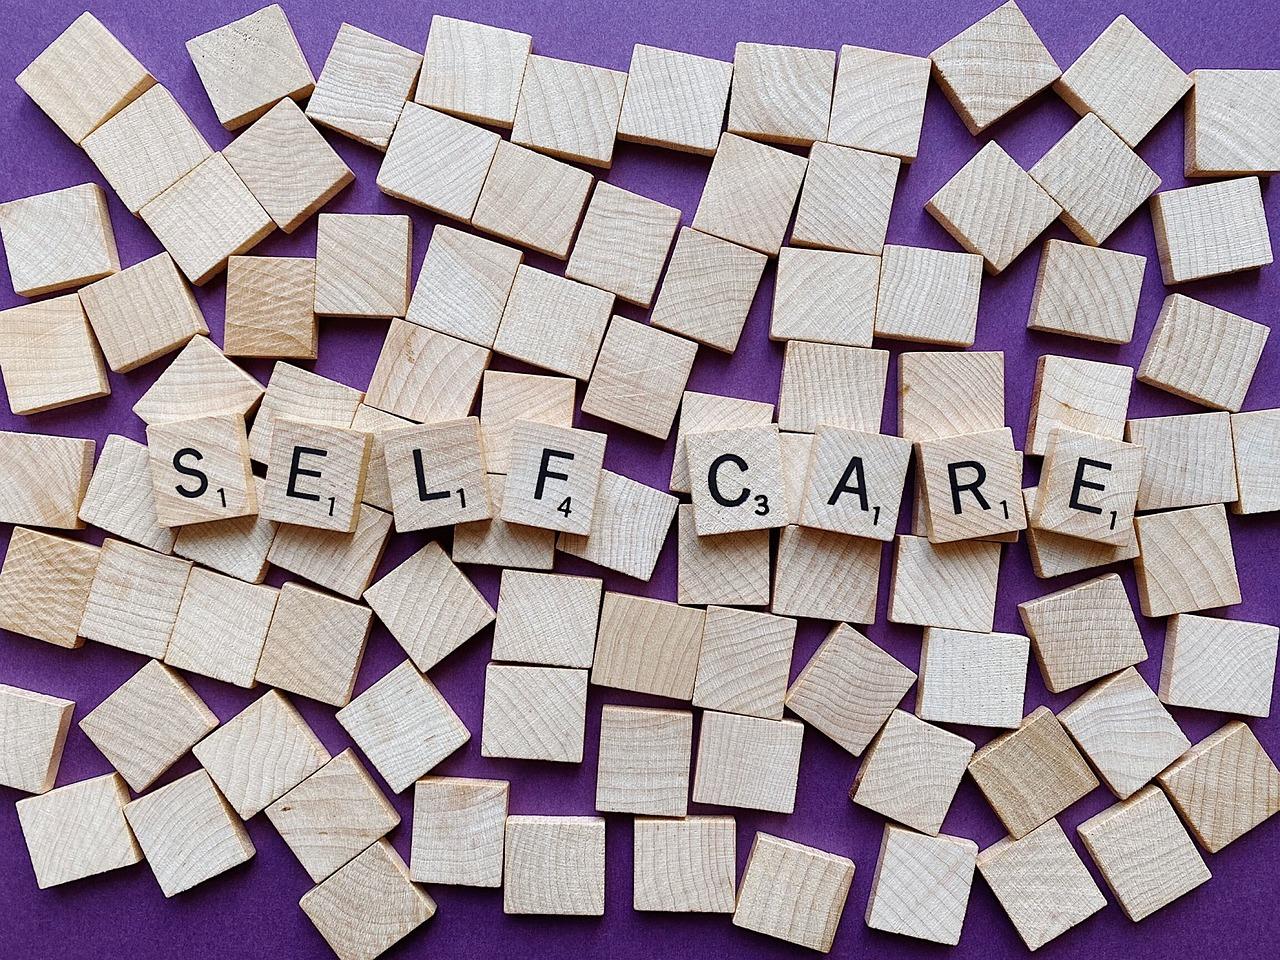 Self Care - Free photo on Pixabay